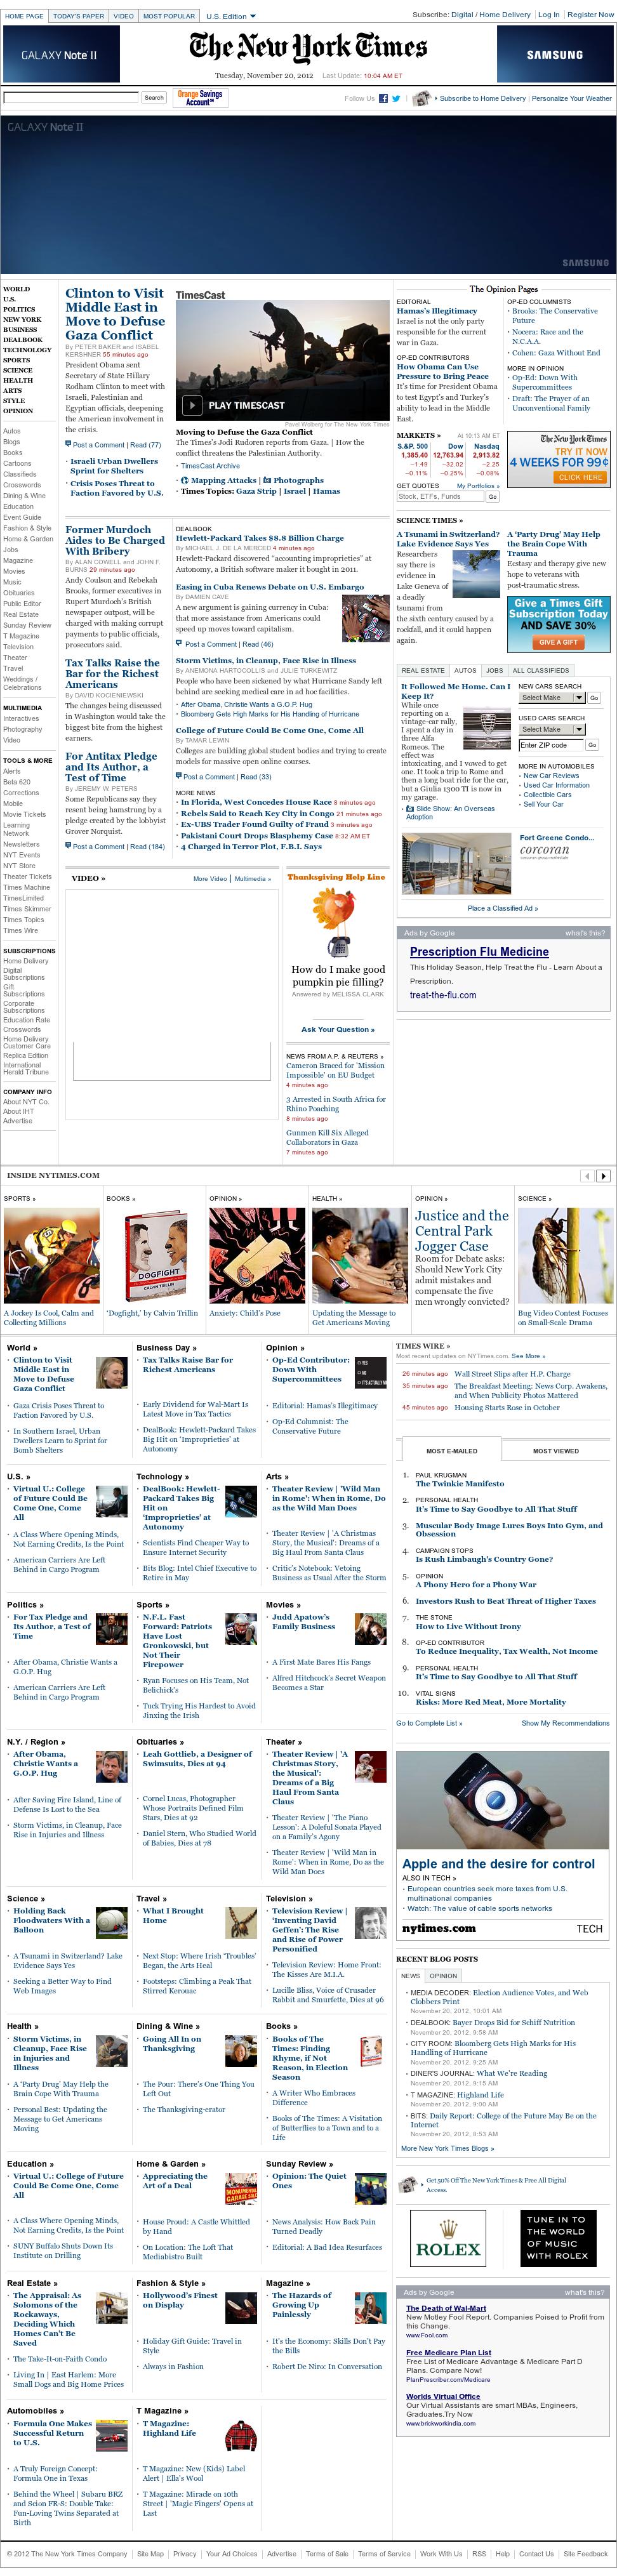 The New York Times at Tuesday Nov. 20, 2012, 3:20 p.m. UTC